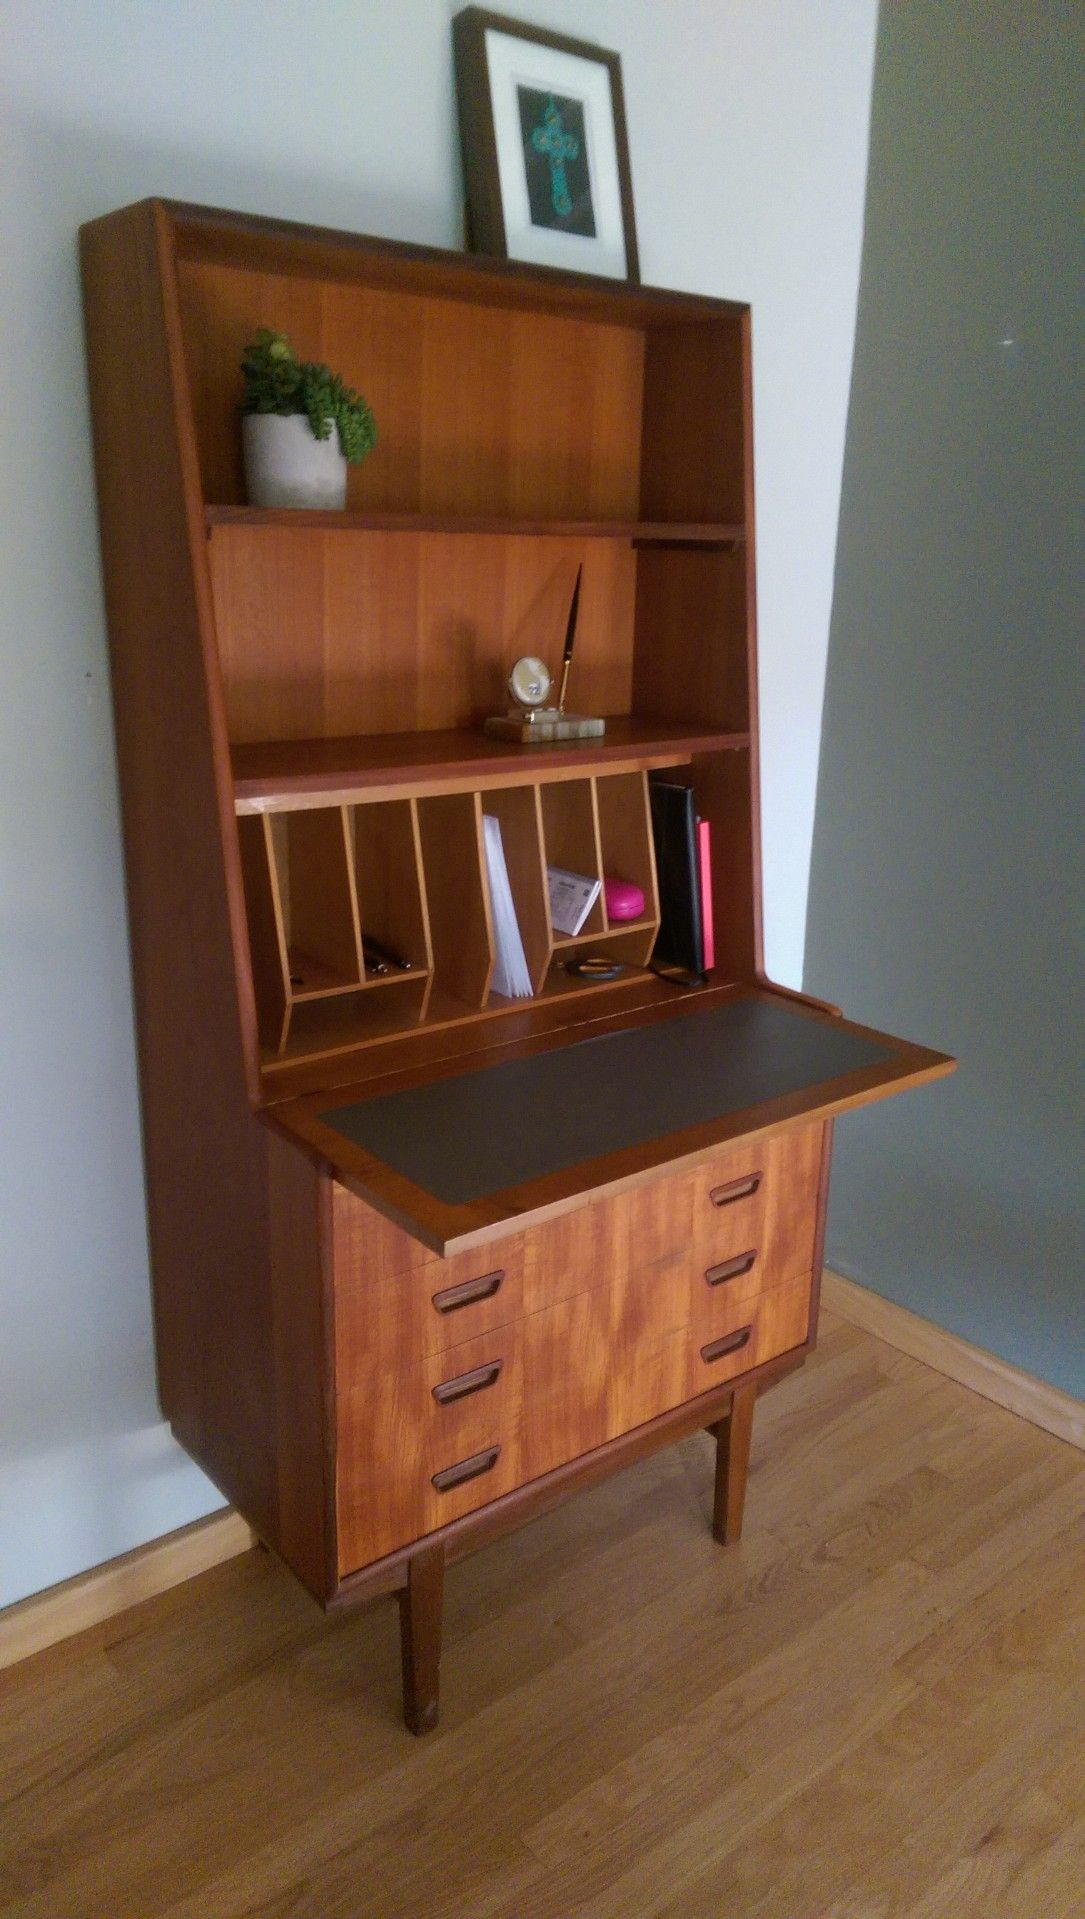 Danish mid century secretary desk opened.